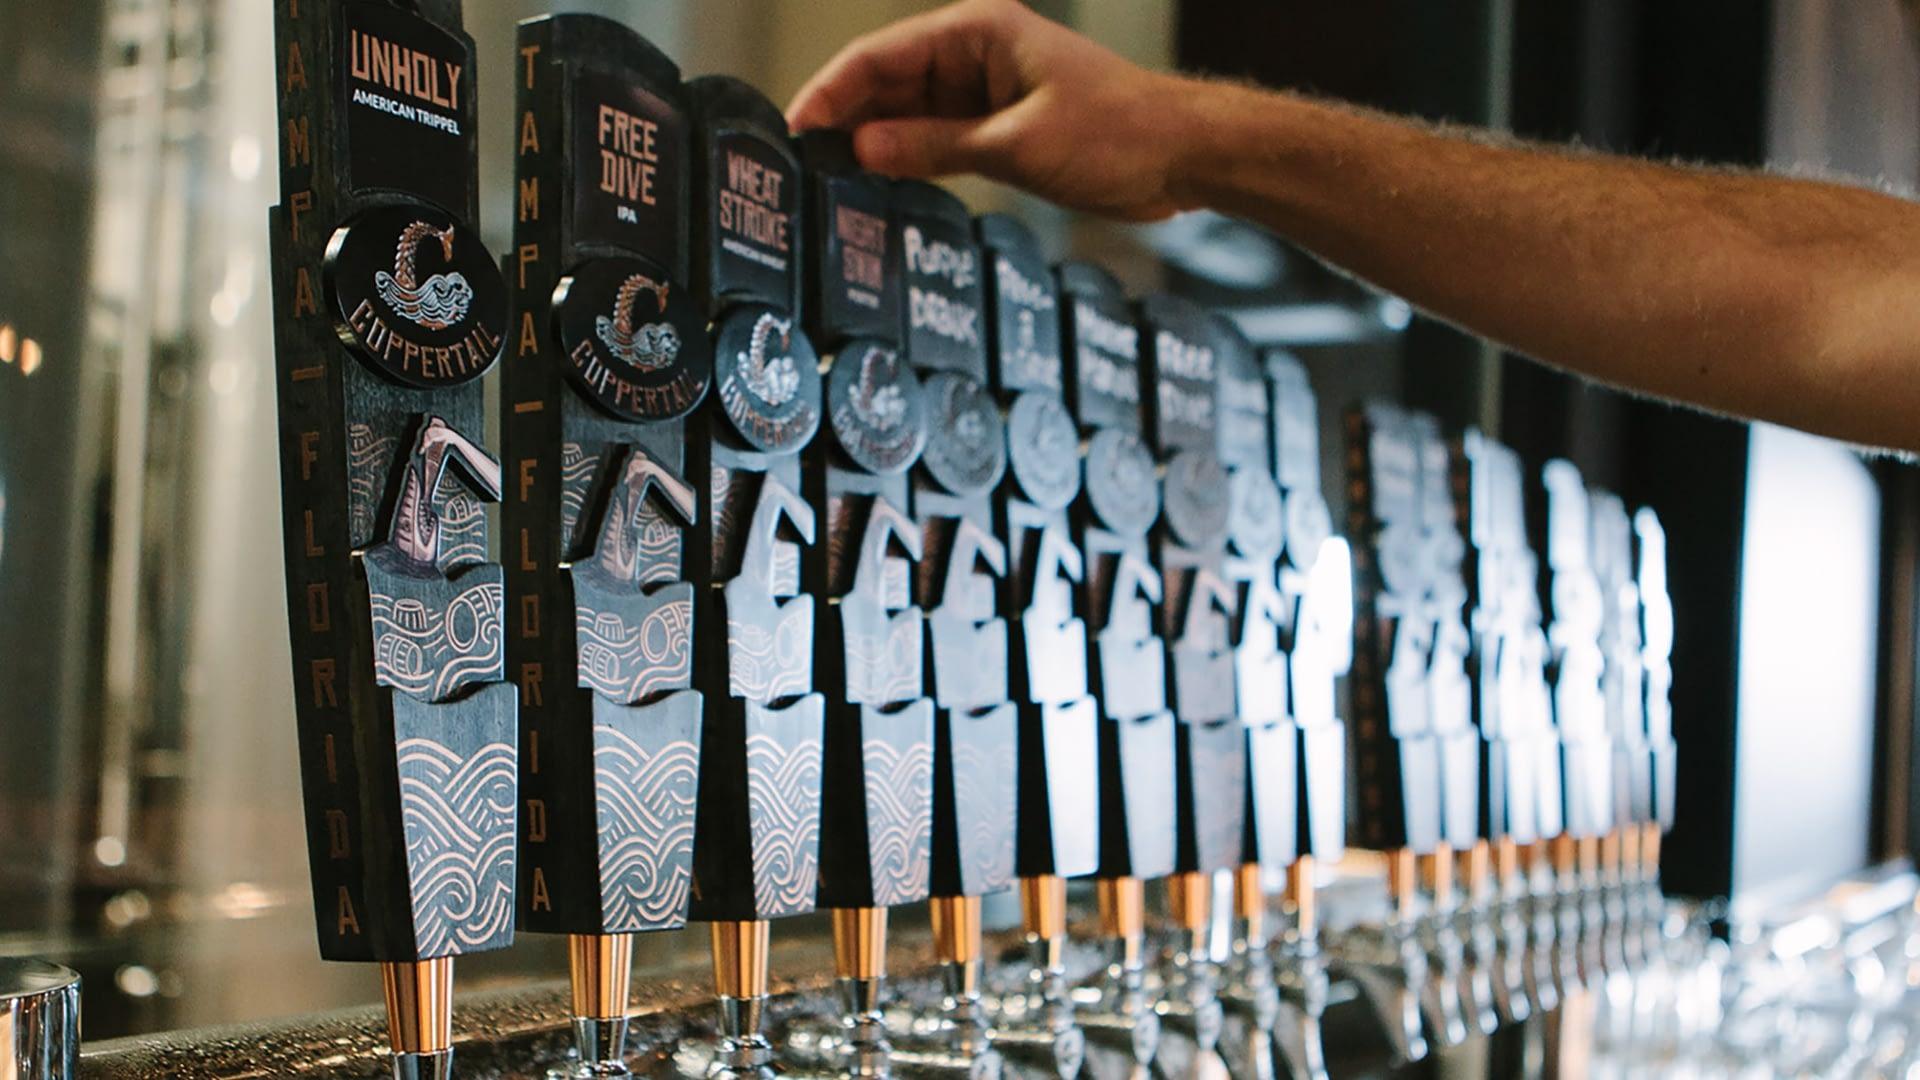 Coppertail beer tap handles